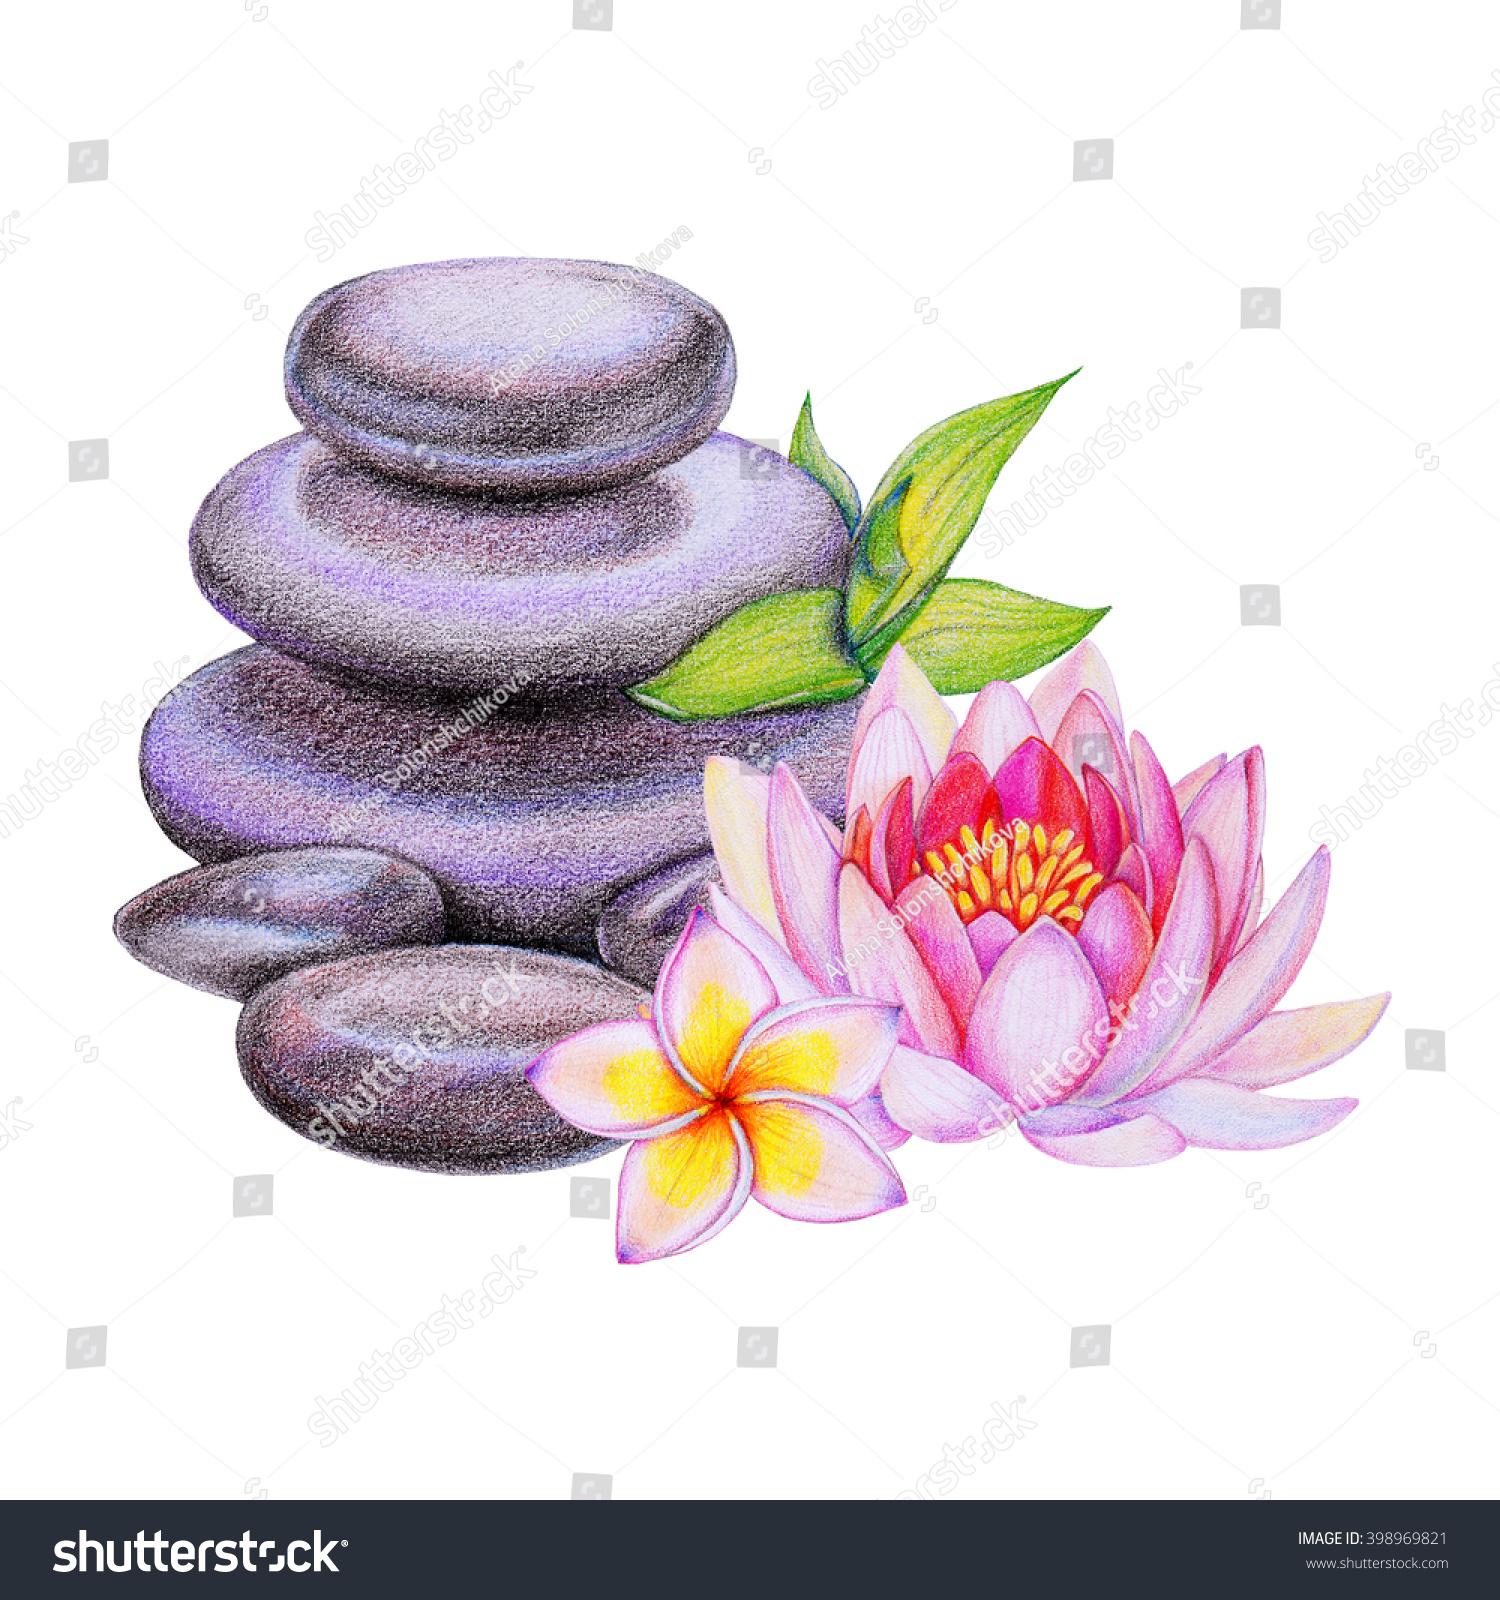 Royalty Free Stock Illustration Of Black Spa Stones Frangipani Pink